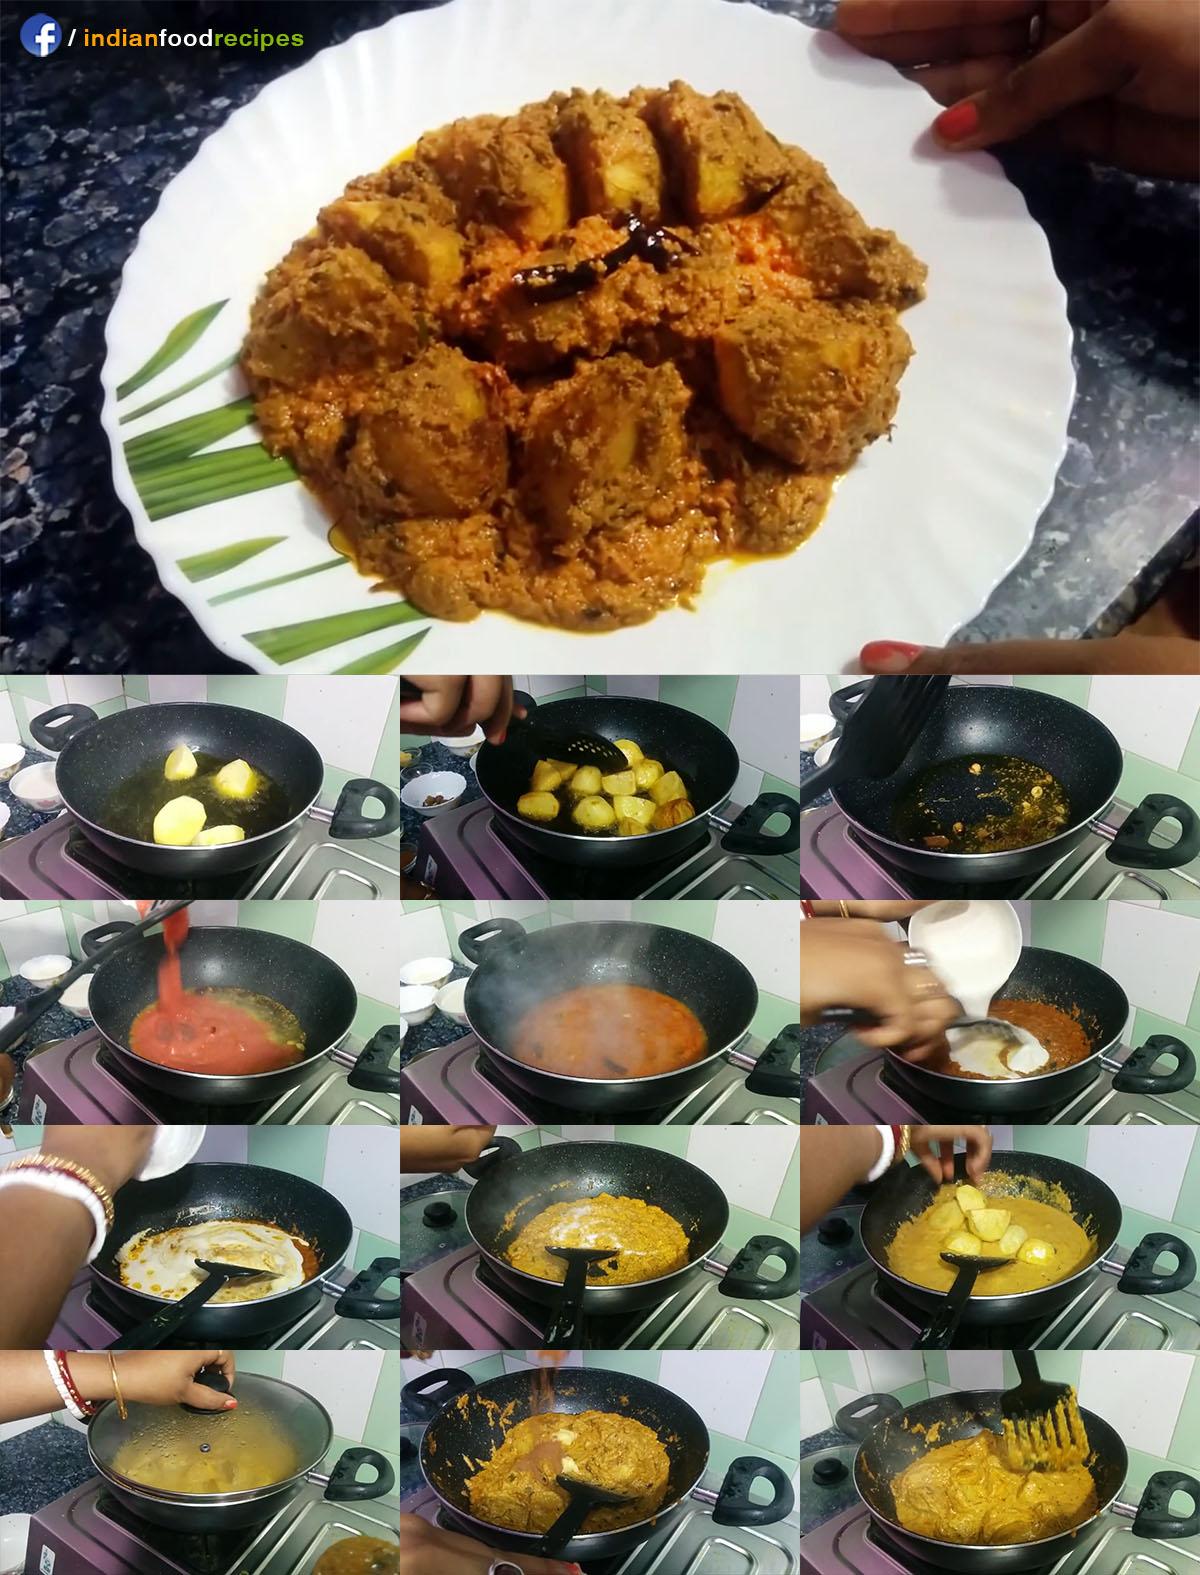 Kashmiri Dum Aloo | Dum Aloo Restaurant Style | Spicy Potato Masala recipe step by step